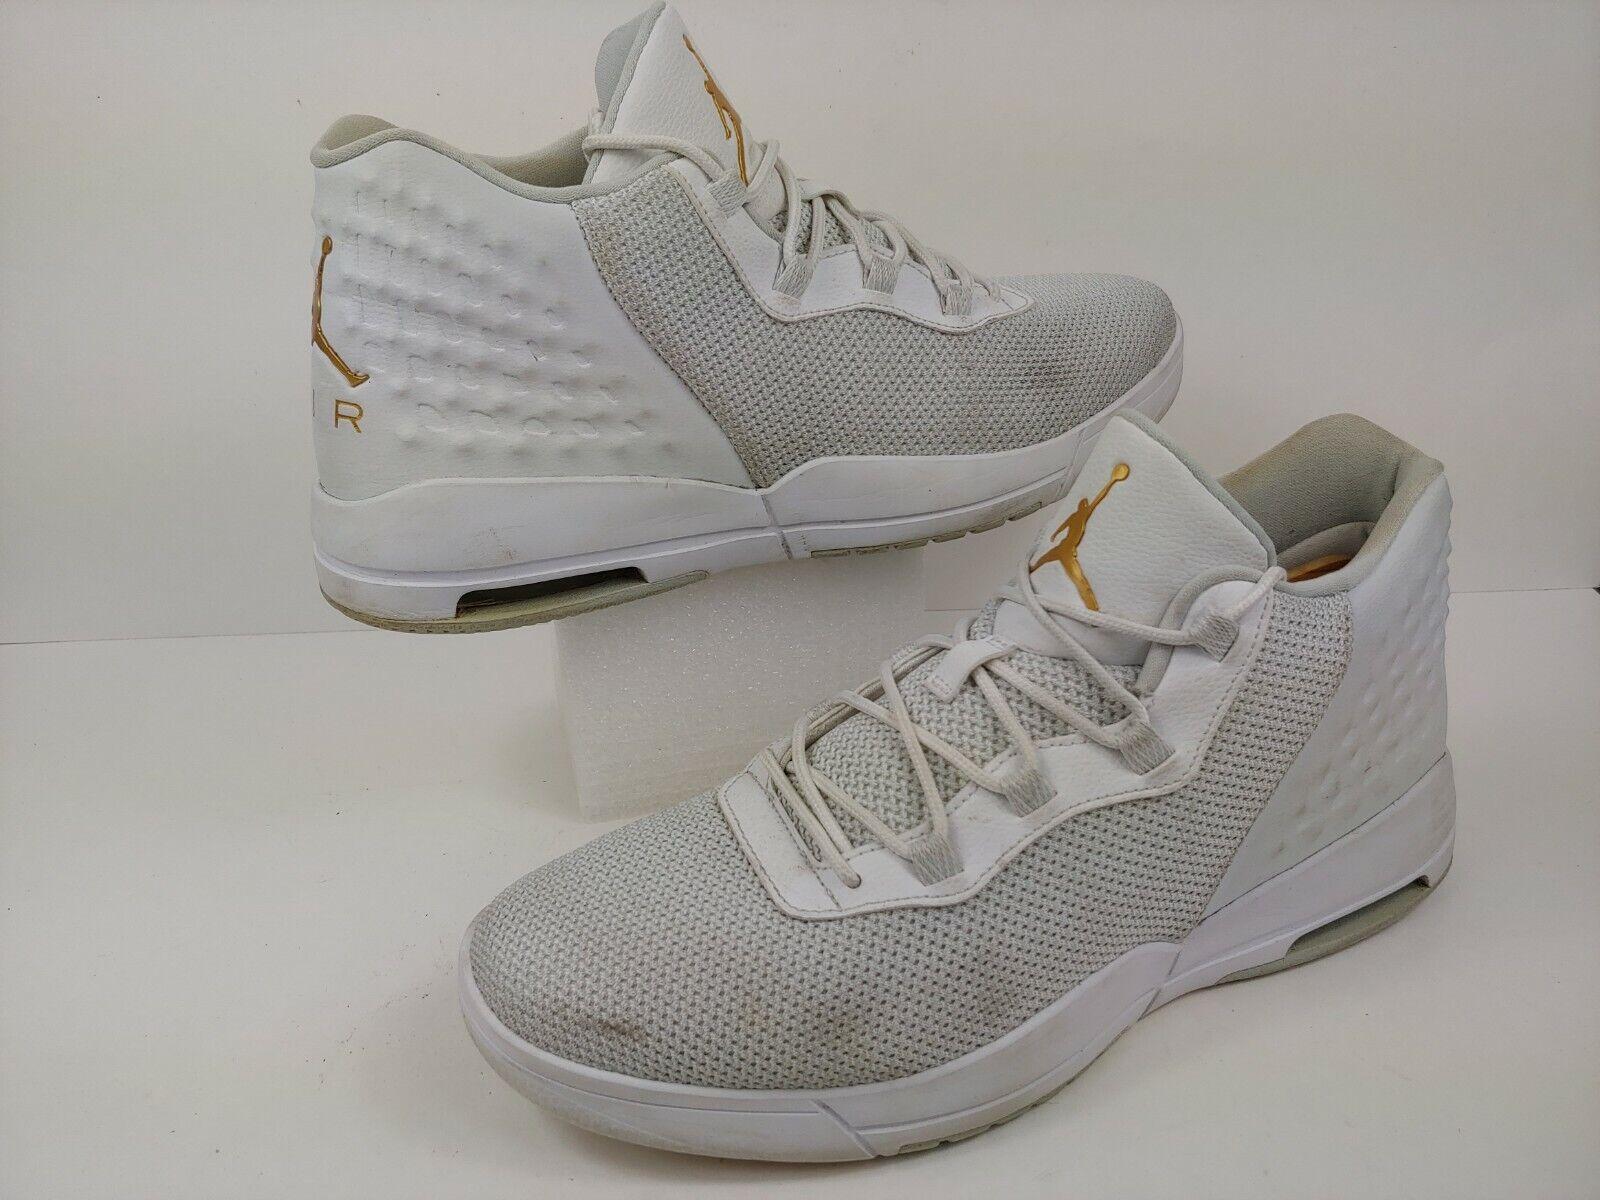 Nike Jordan Kids' Jordan Academy White